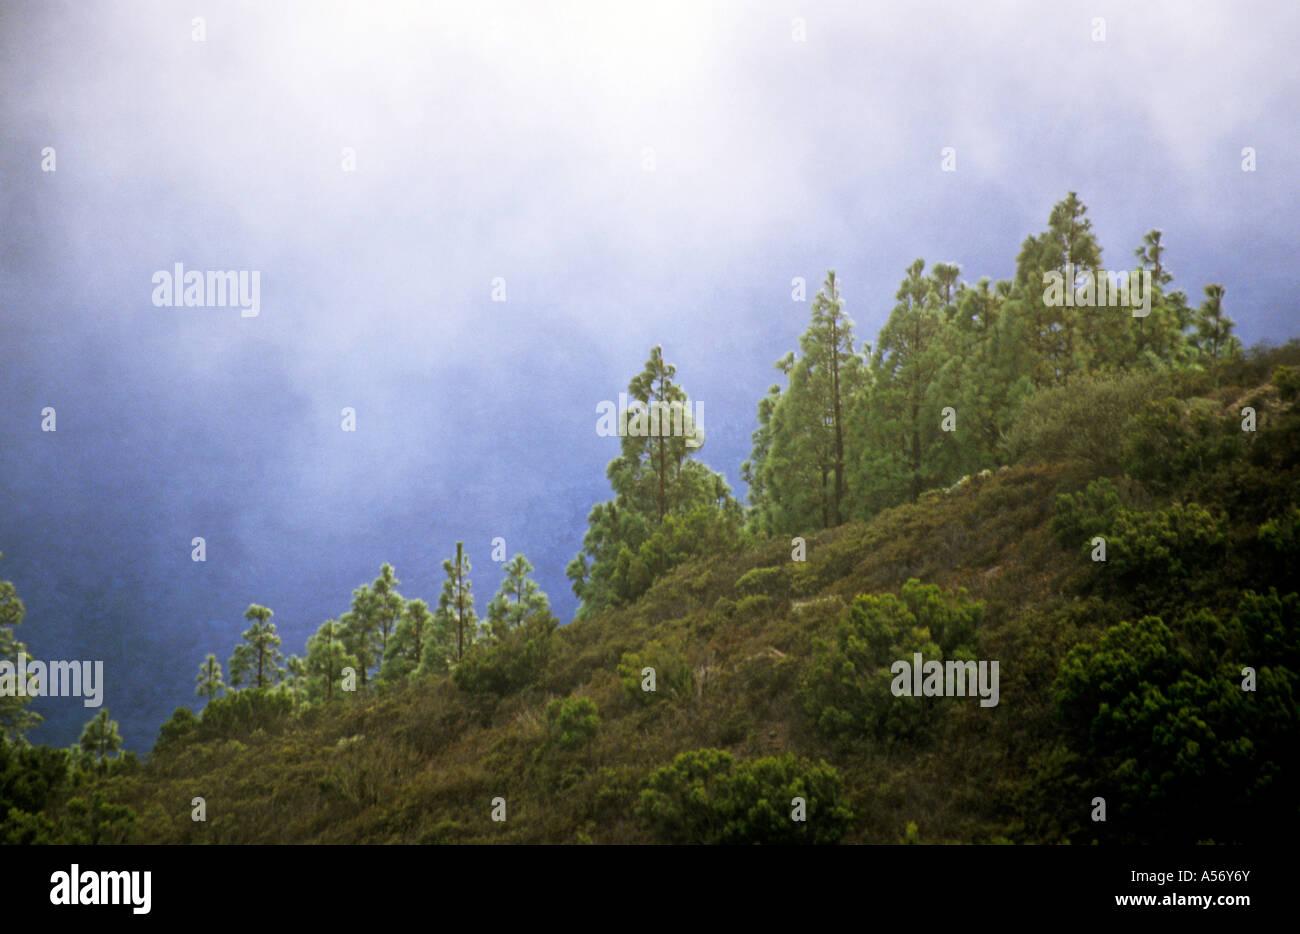 Spain, la Gomera, wood in mist - Stock Image